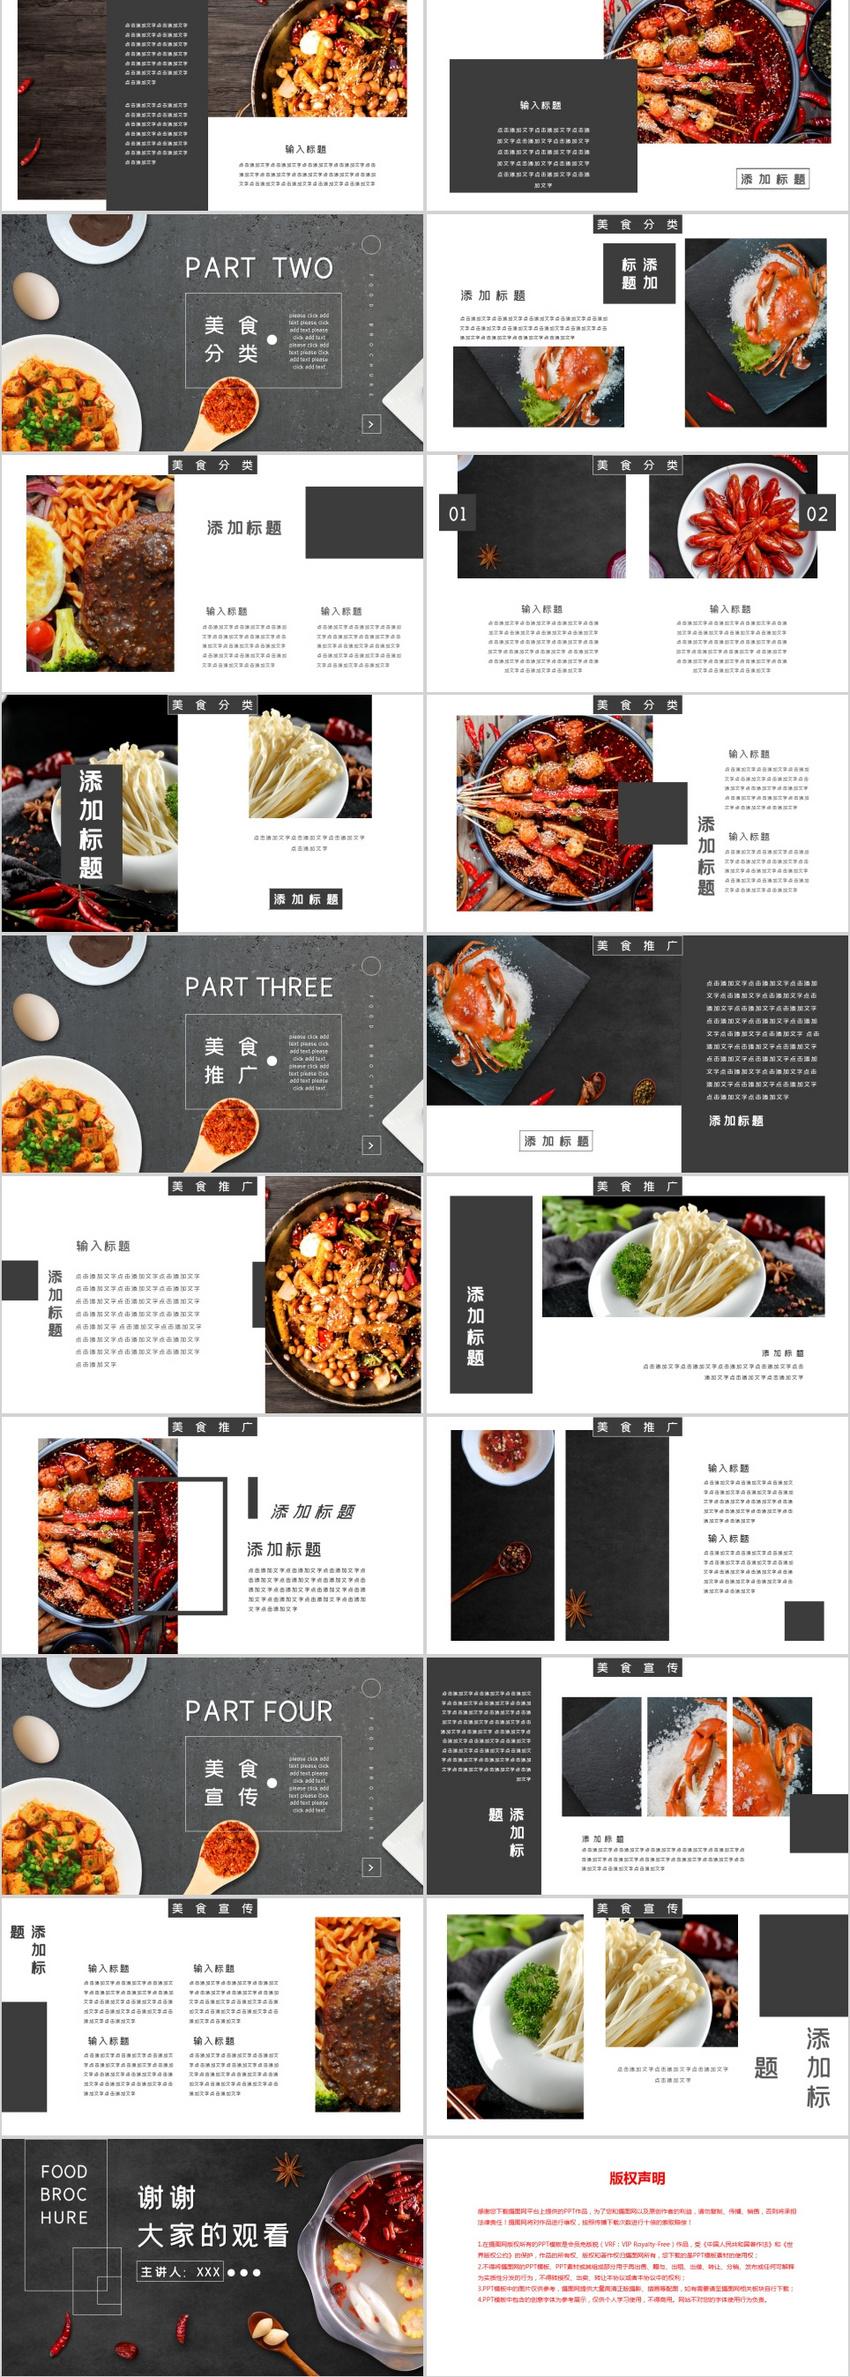 Hot Pot Gourmet Brochure Ppt Template Powerpoint Templete Ppt Free Download 401656195 Lovepik Com